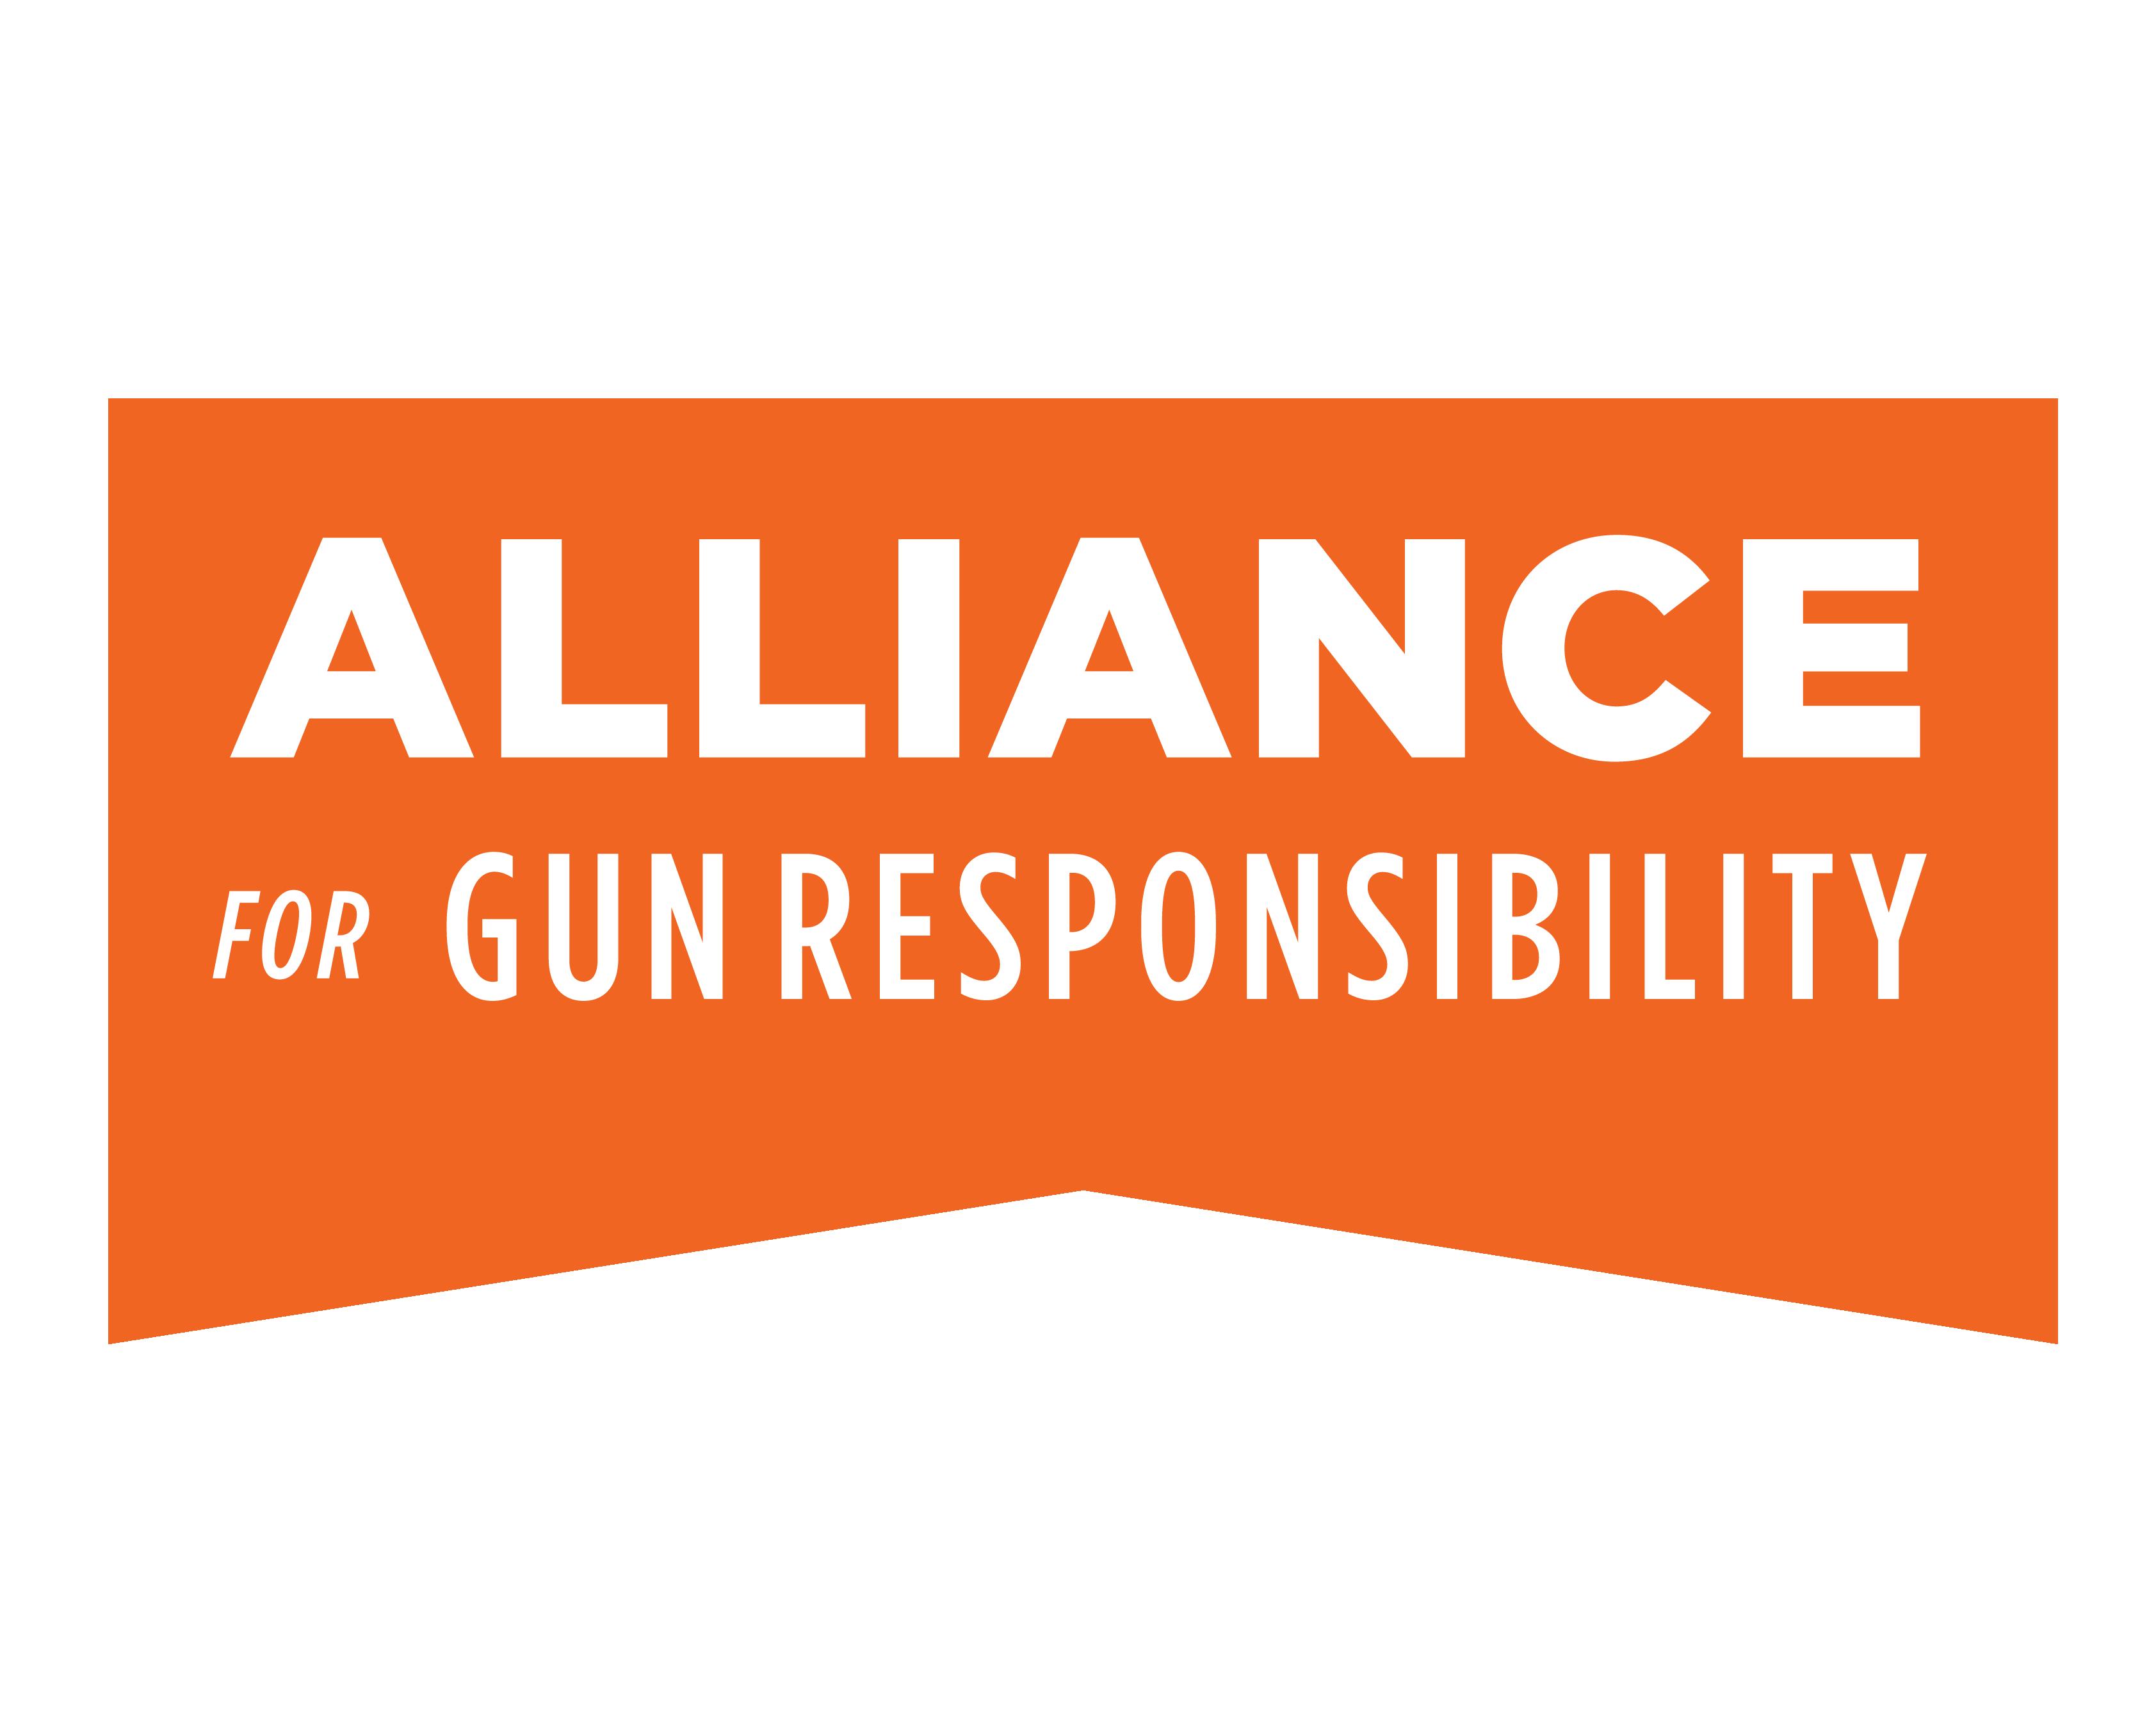 Alliance for Gun Responsibility Foundation